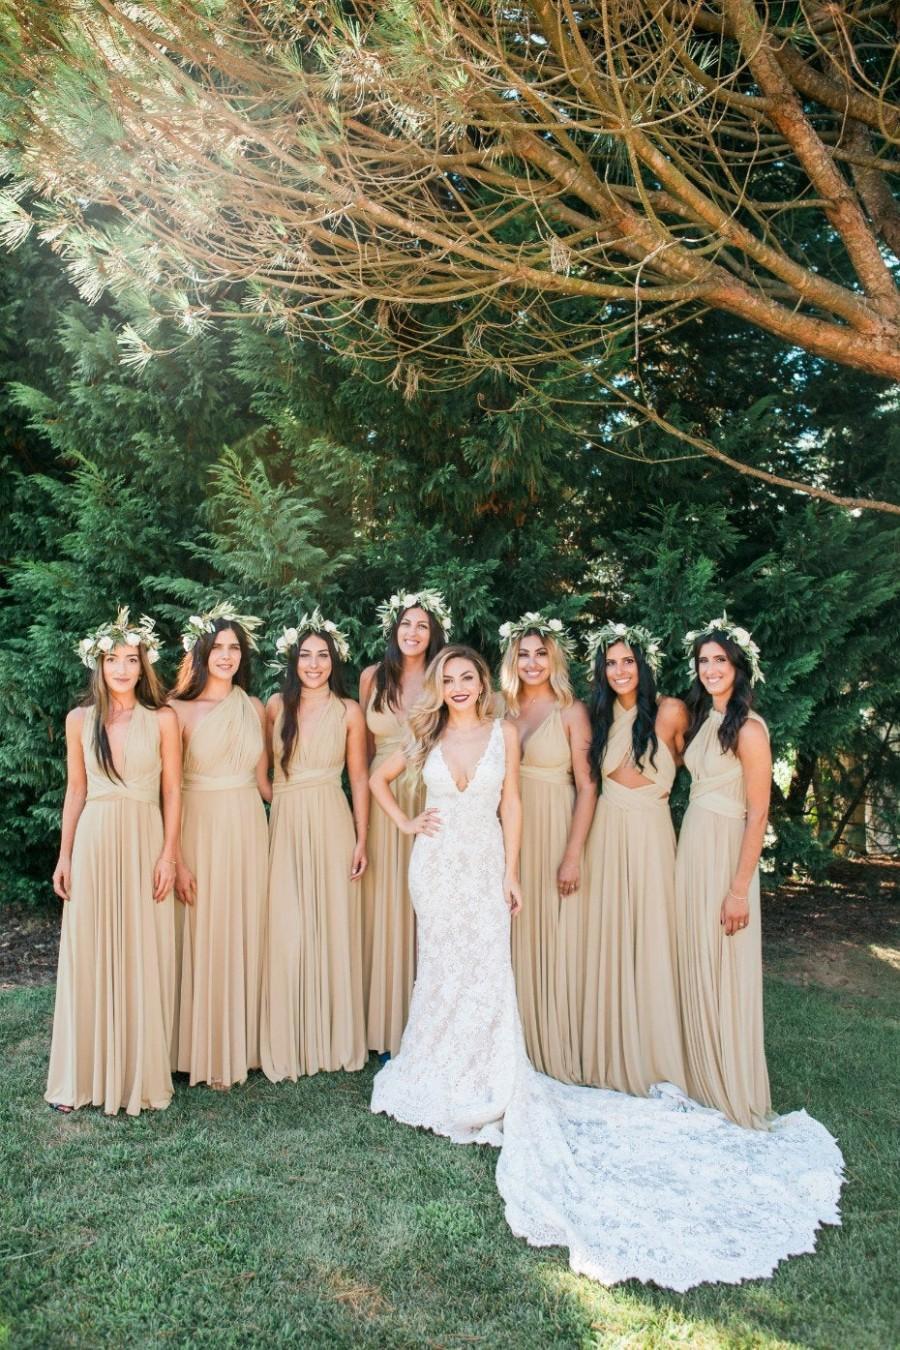 Wedding - Beige Floor Length Bridesmaid Dress Convertible Bridesmaid Dress Multiway Dress Infinity Bridesmaid Dress Maternity Dress Ball Gown Wedding